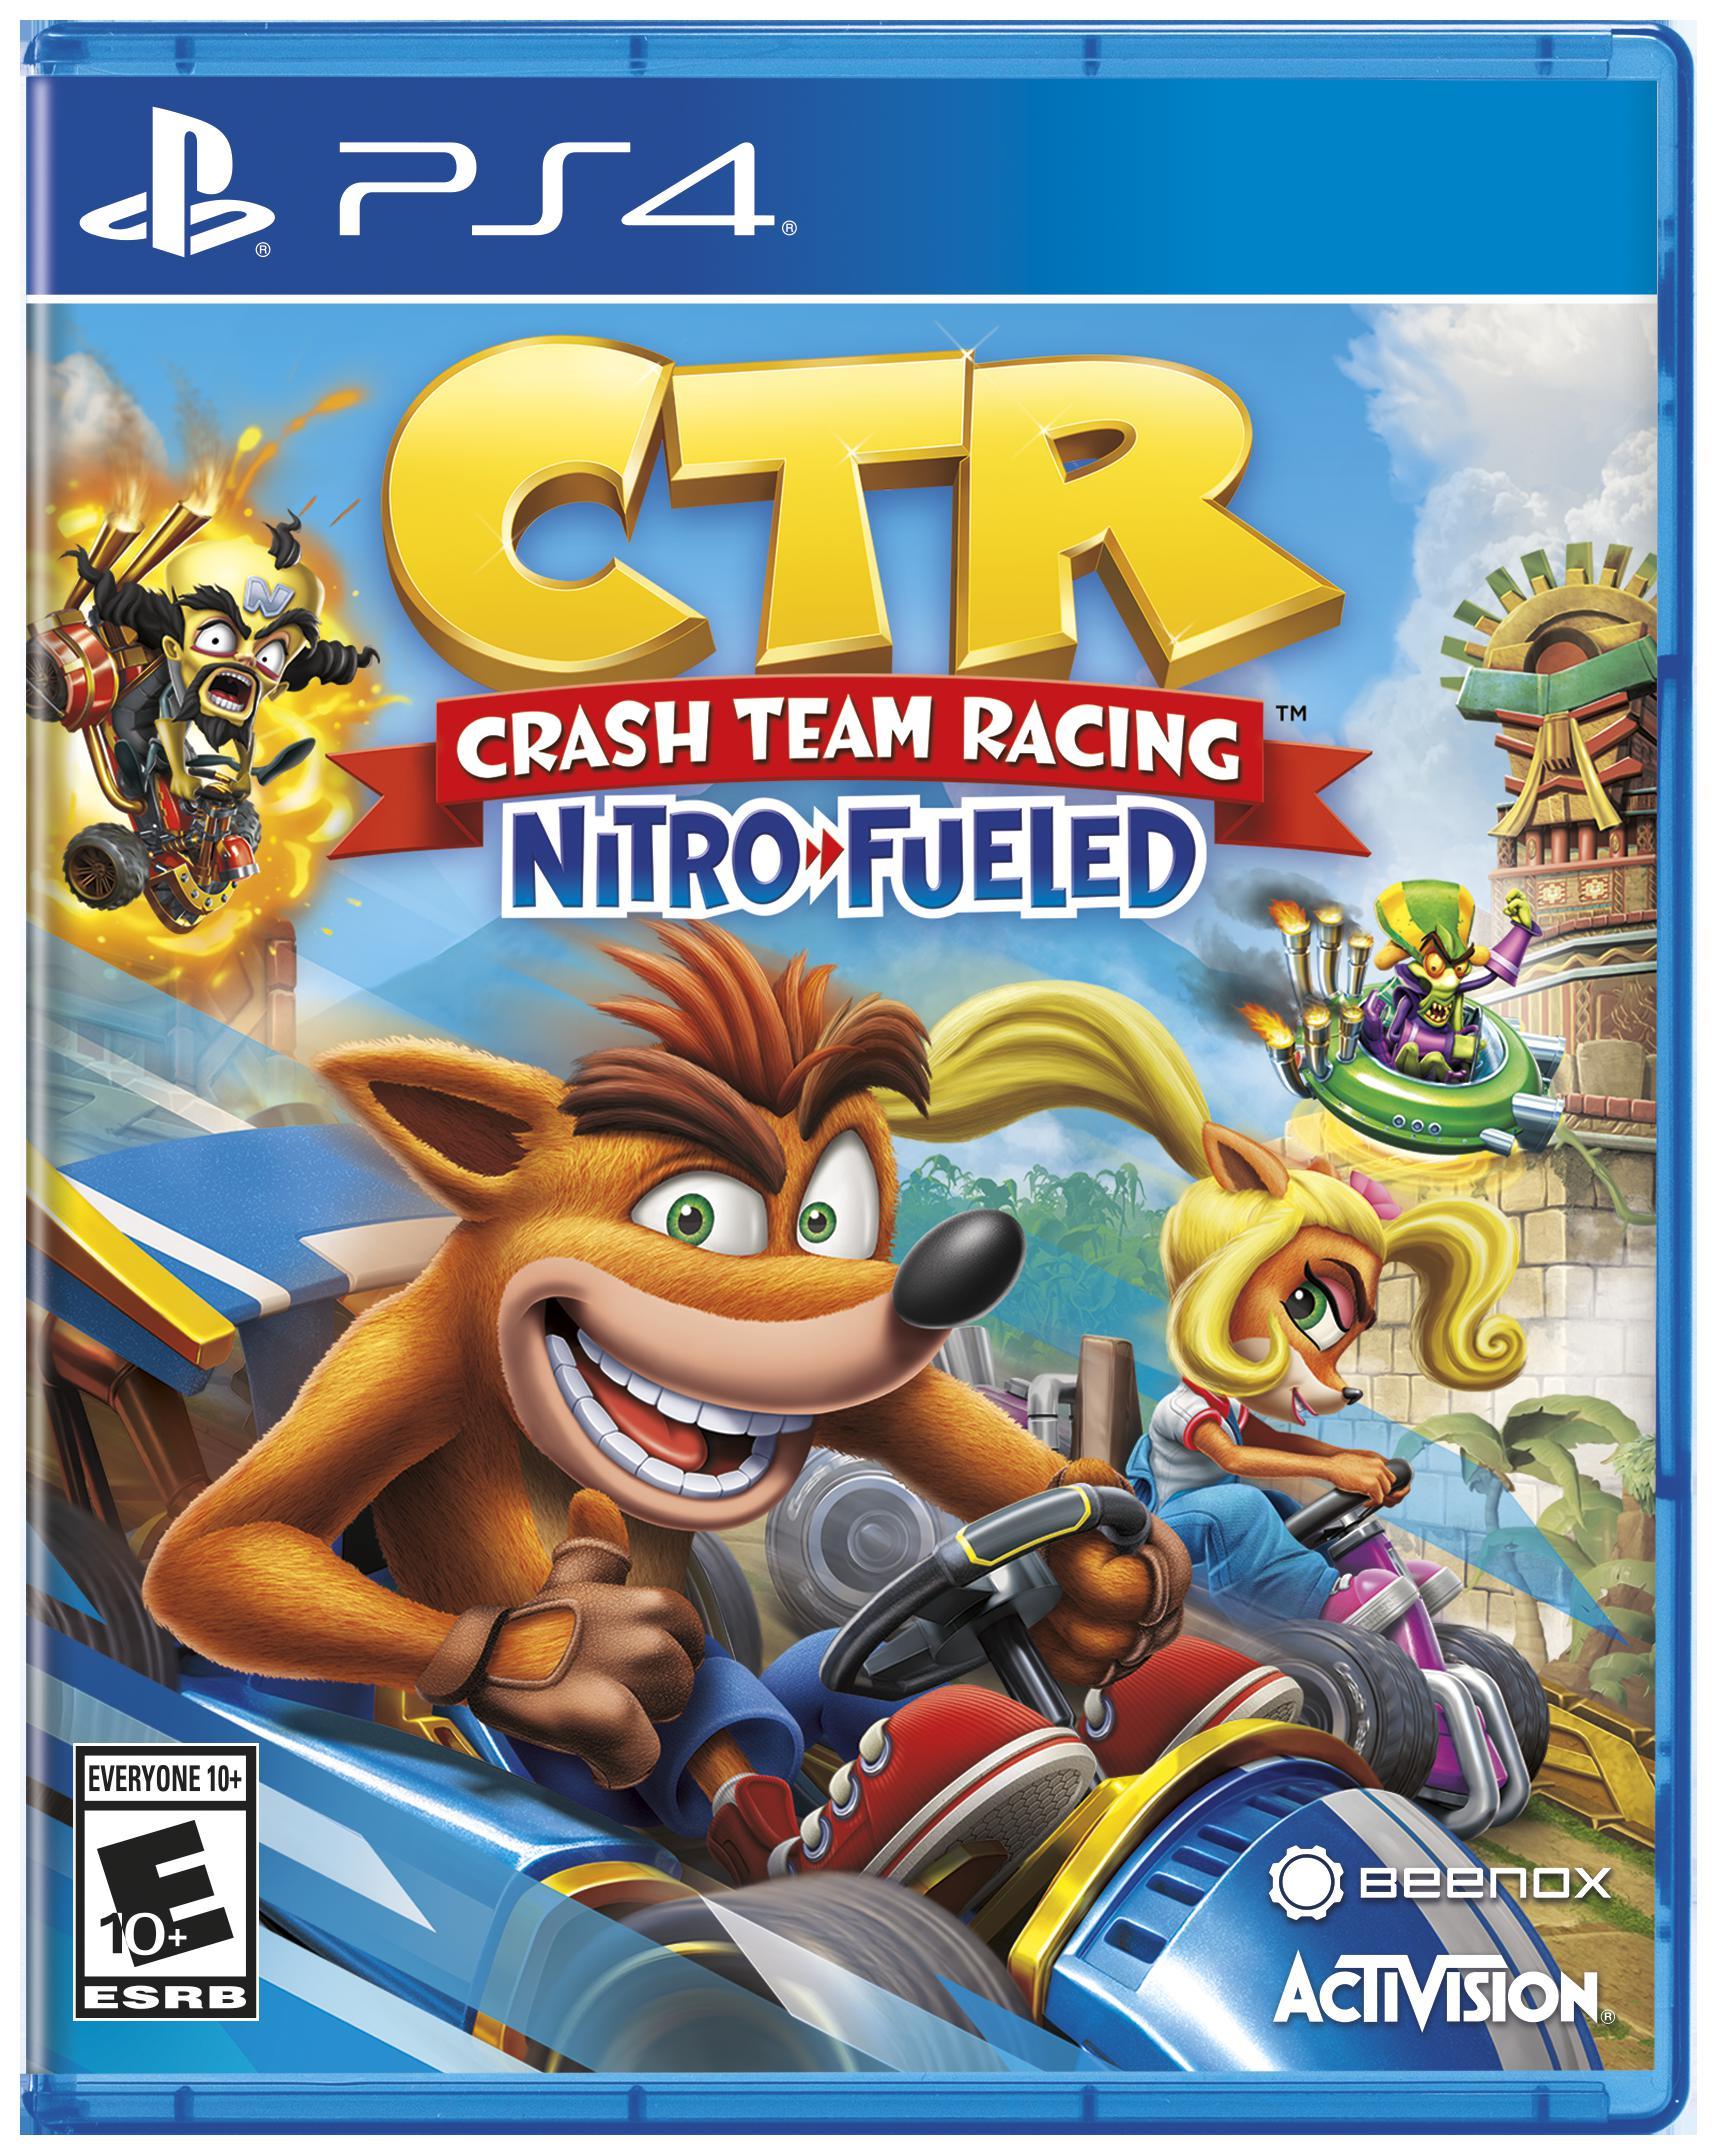 Crash Team Racing: Nitro Fueled PlayStation 4 Game Walmart $20